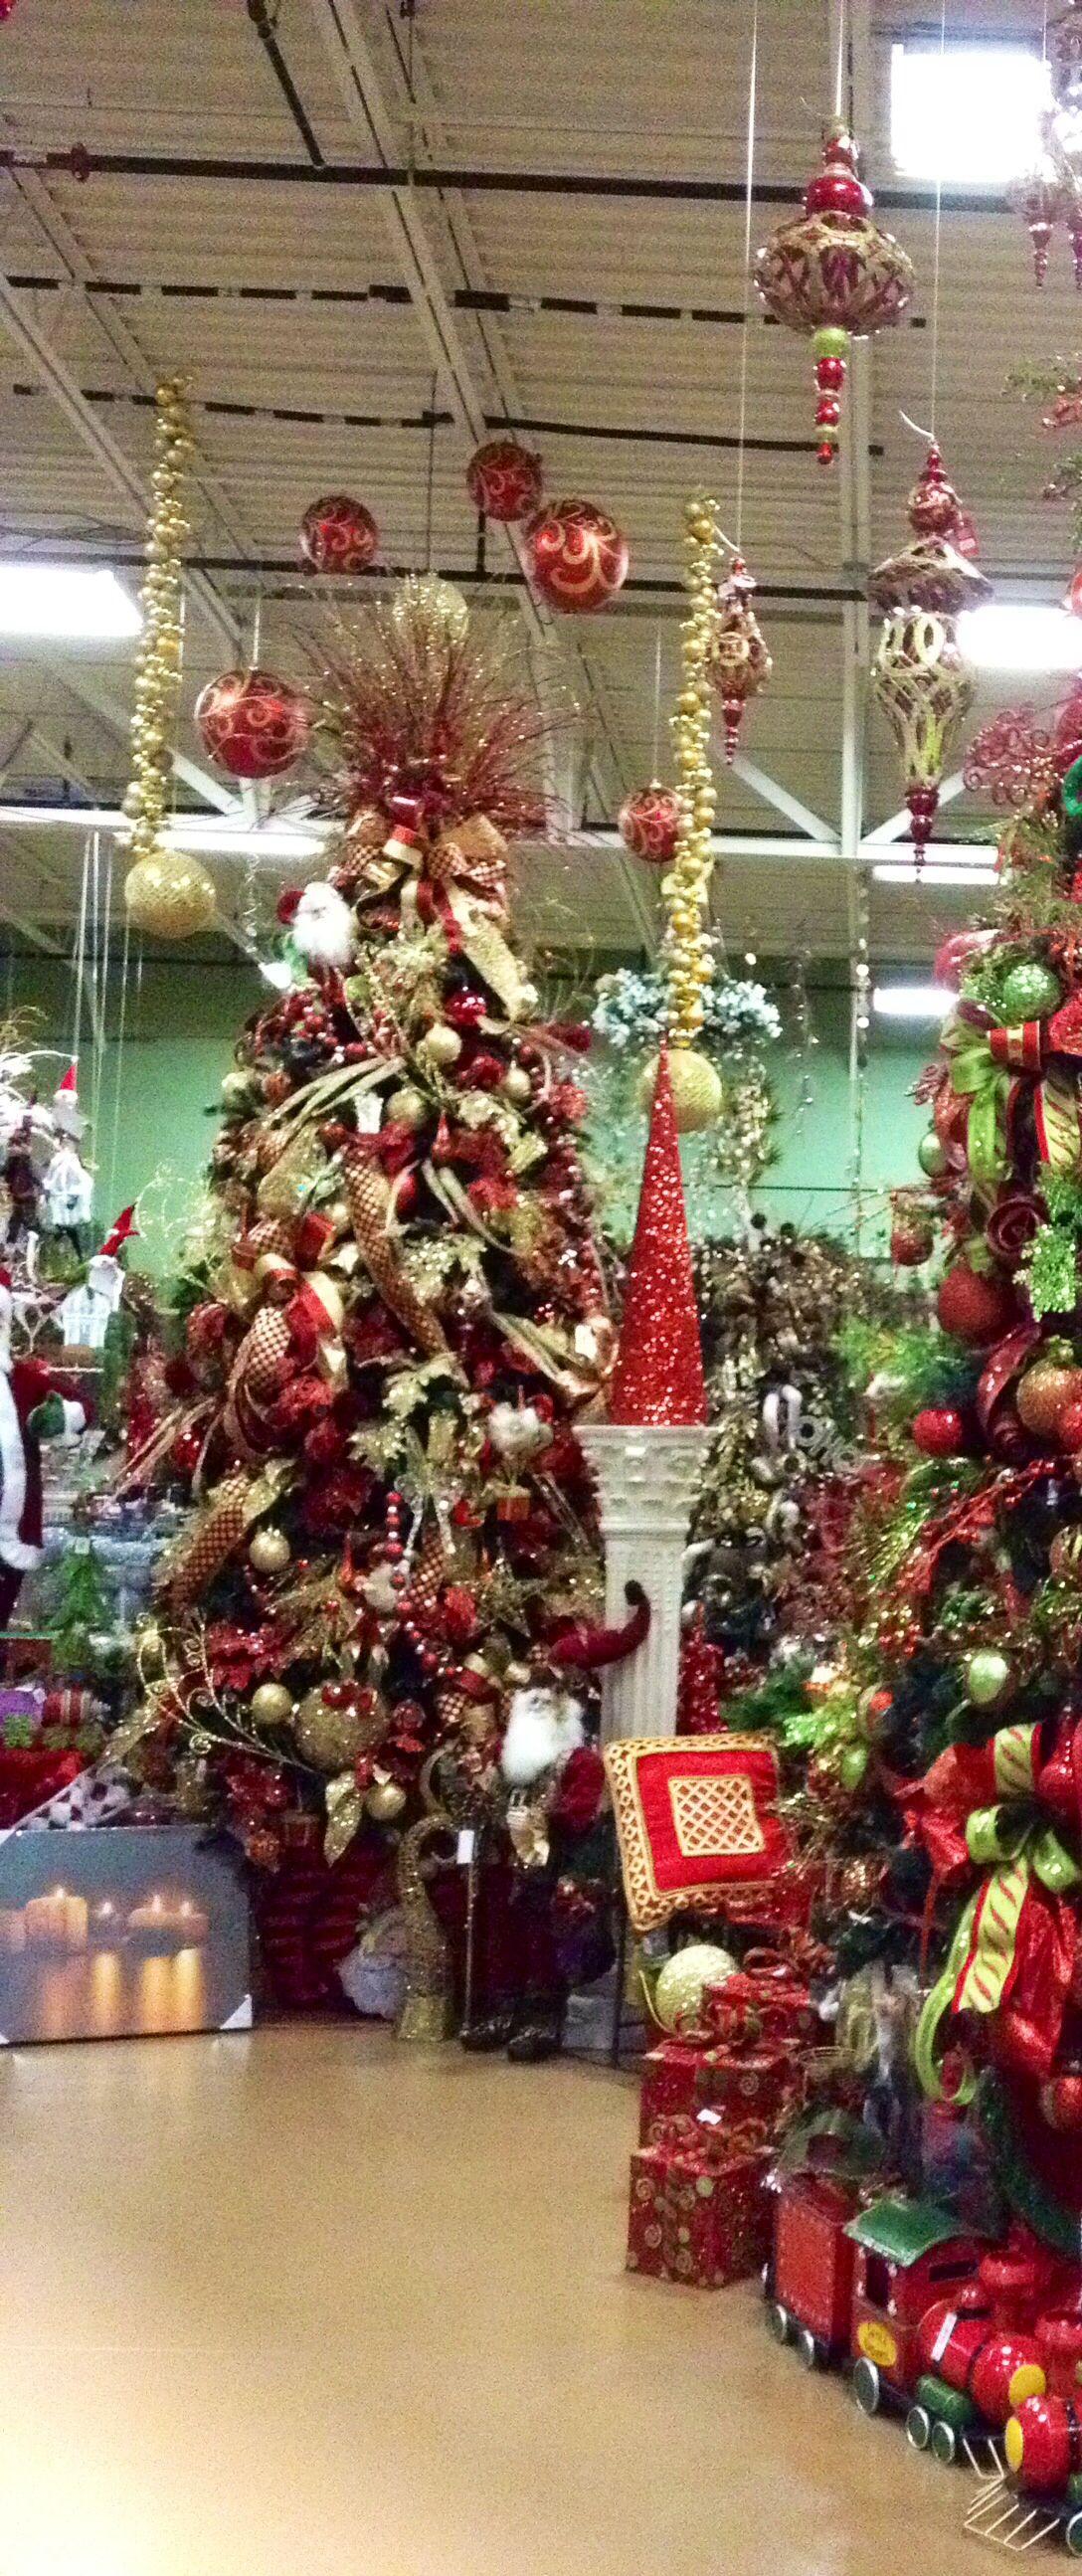 #Christmas At Arcadia Floral & Home Decor Showroom